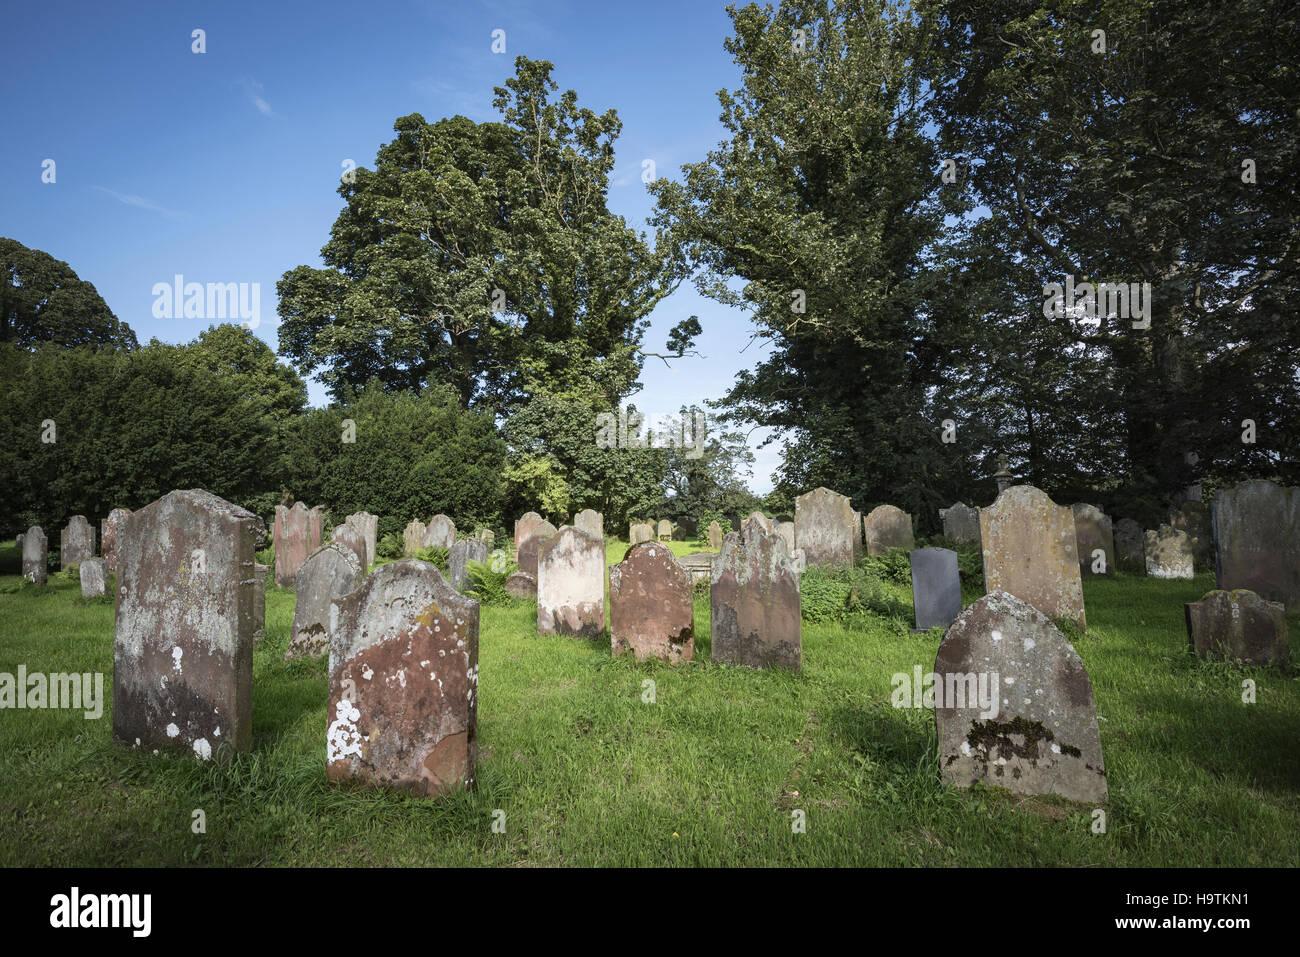 Old grave stones in cemetery, Cumbria, England, United Kingdom - Stock Image